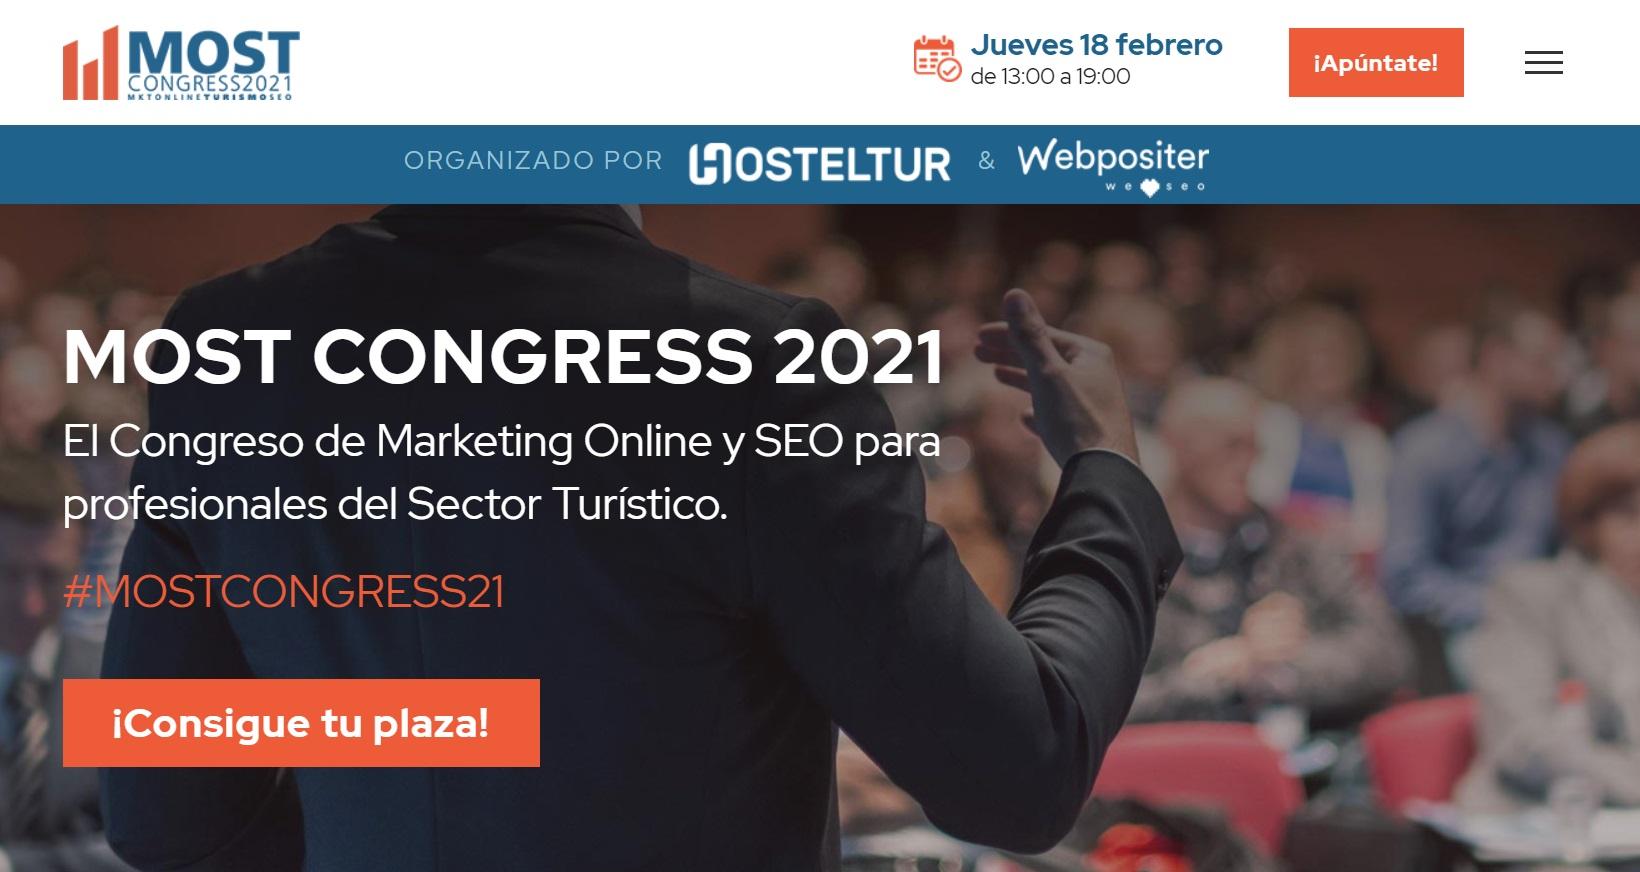 congreso-turismo-online-most-congress-21